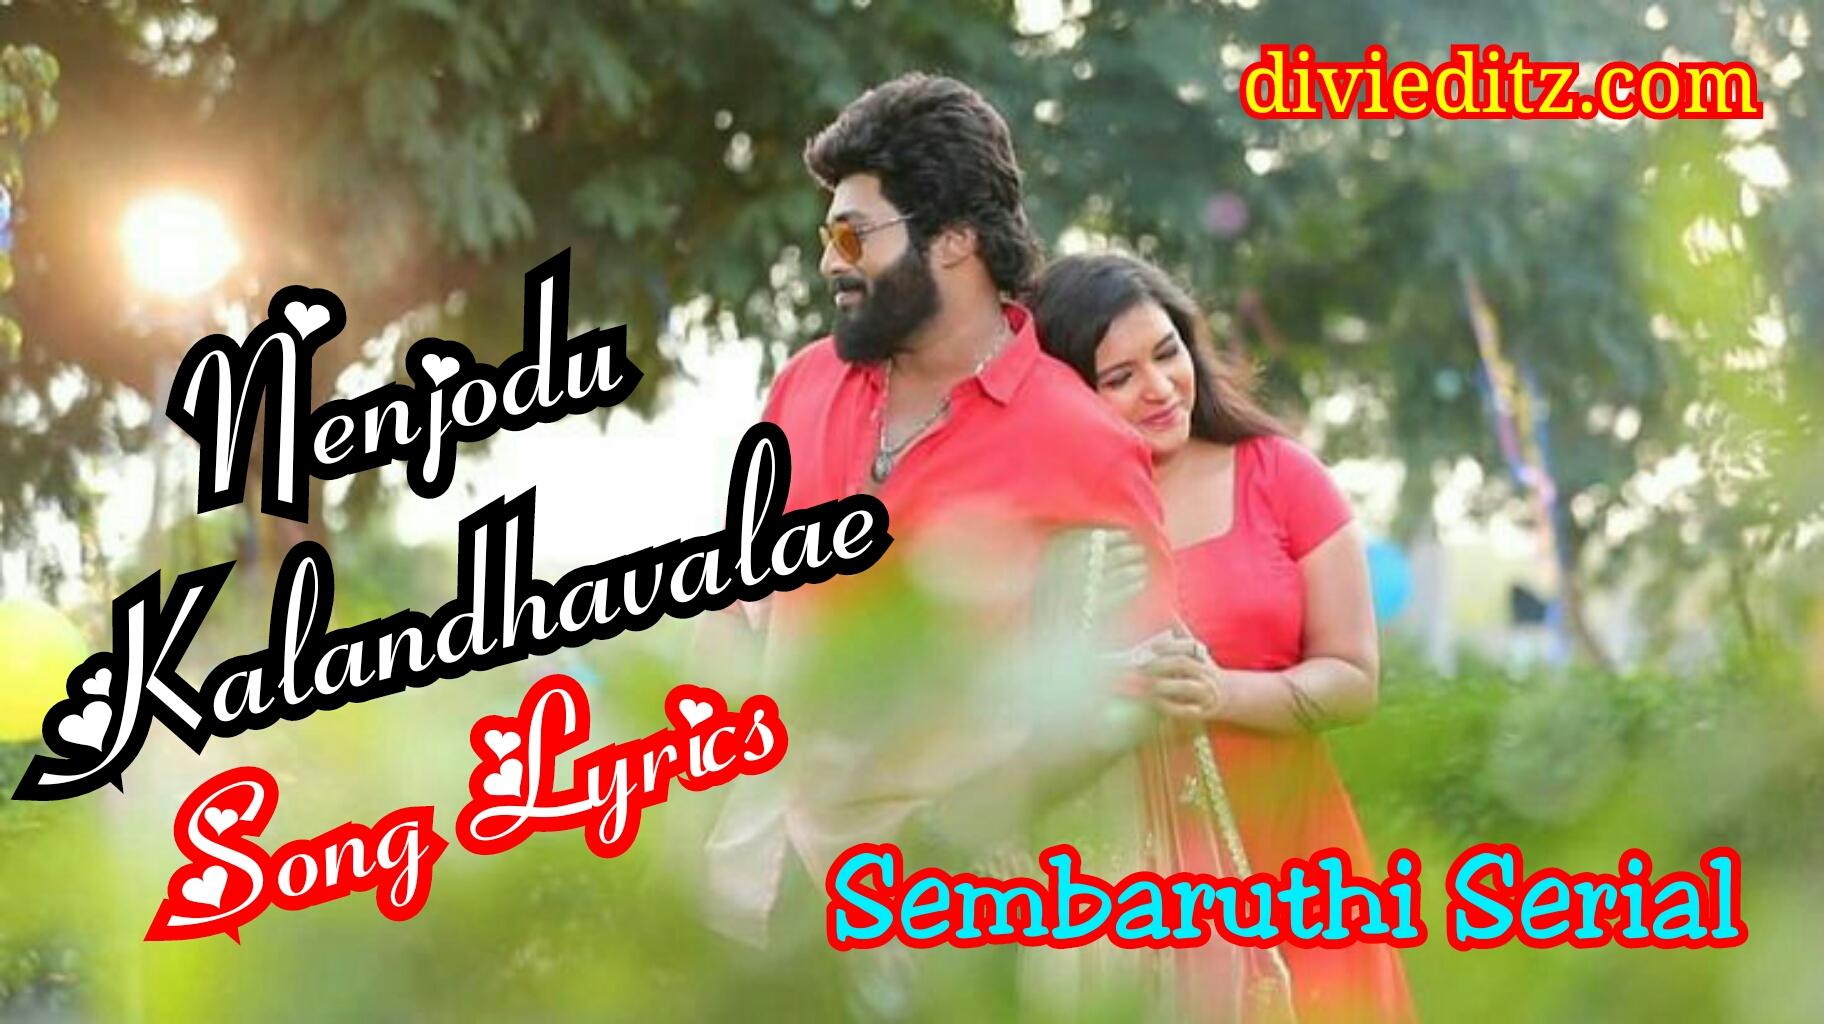 Nenjodu Kalandhavalae song lyrics – Sembaruthi Serial